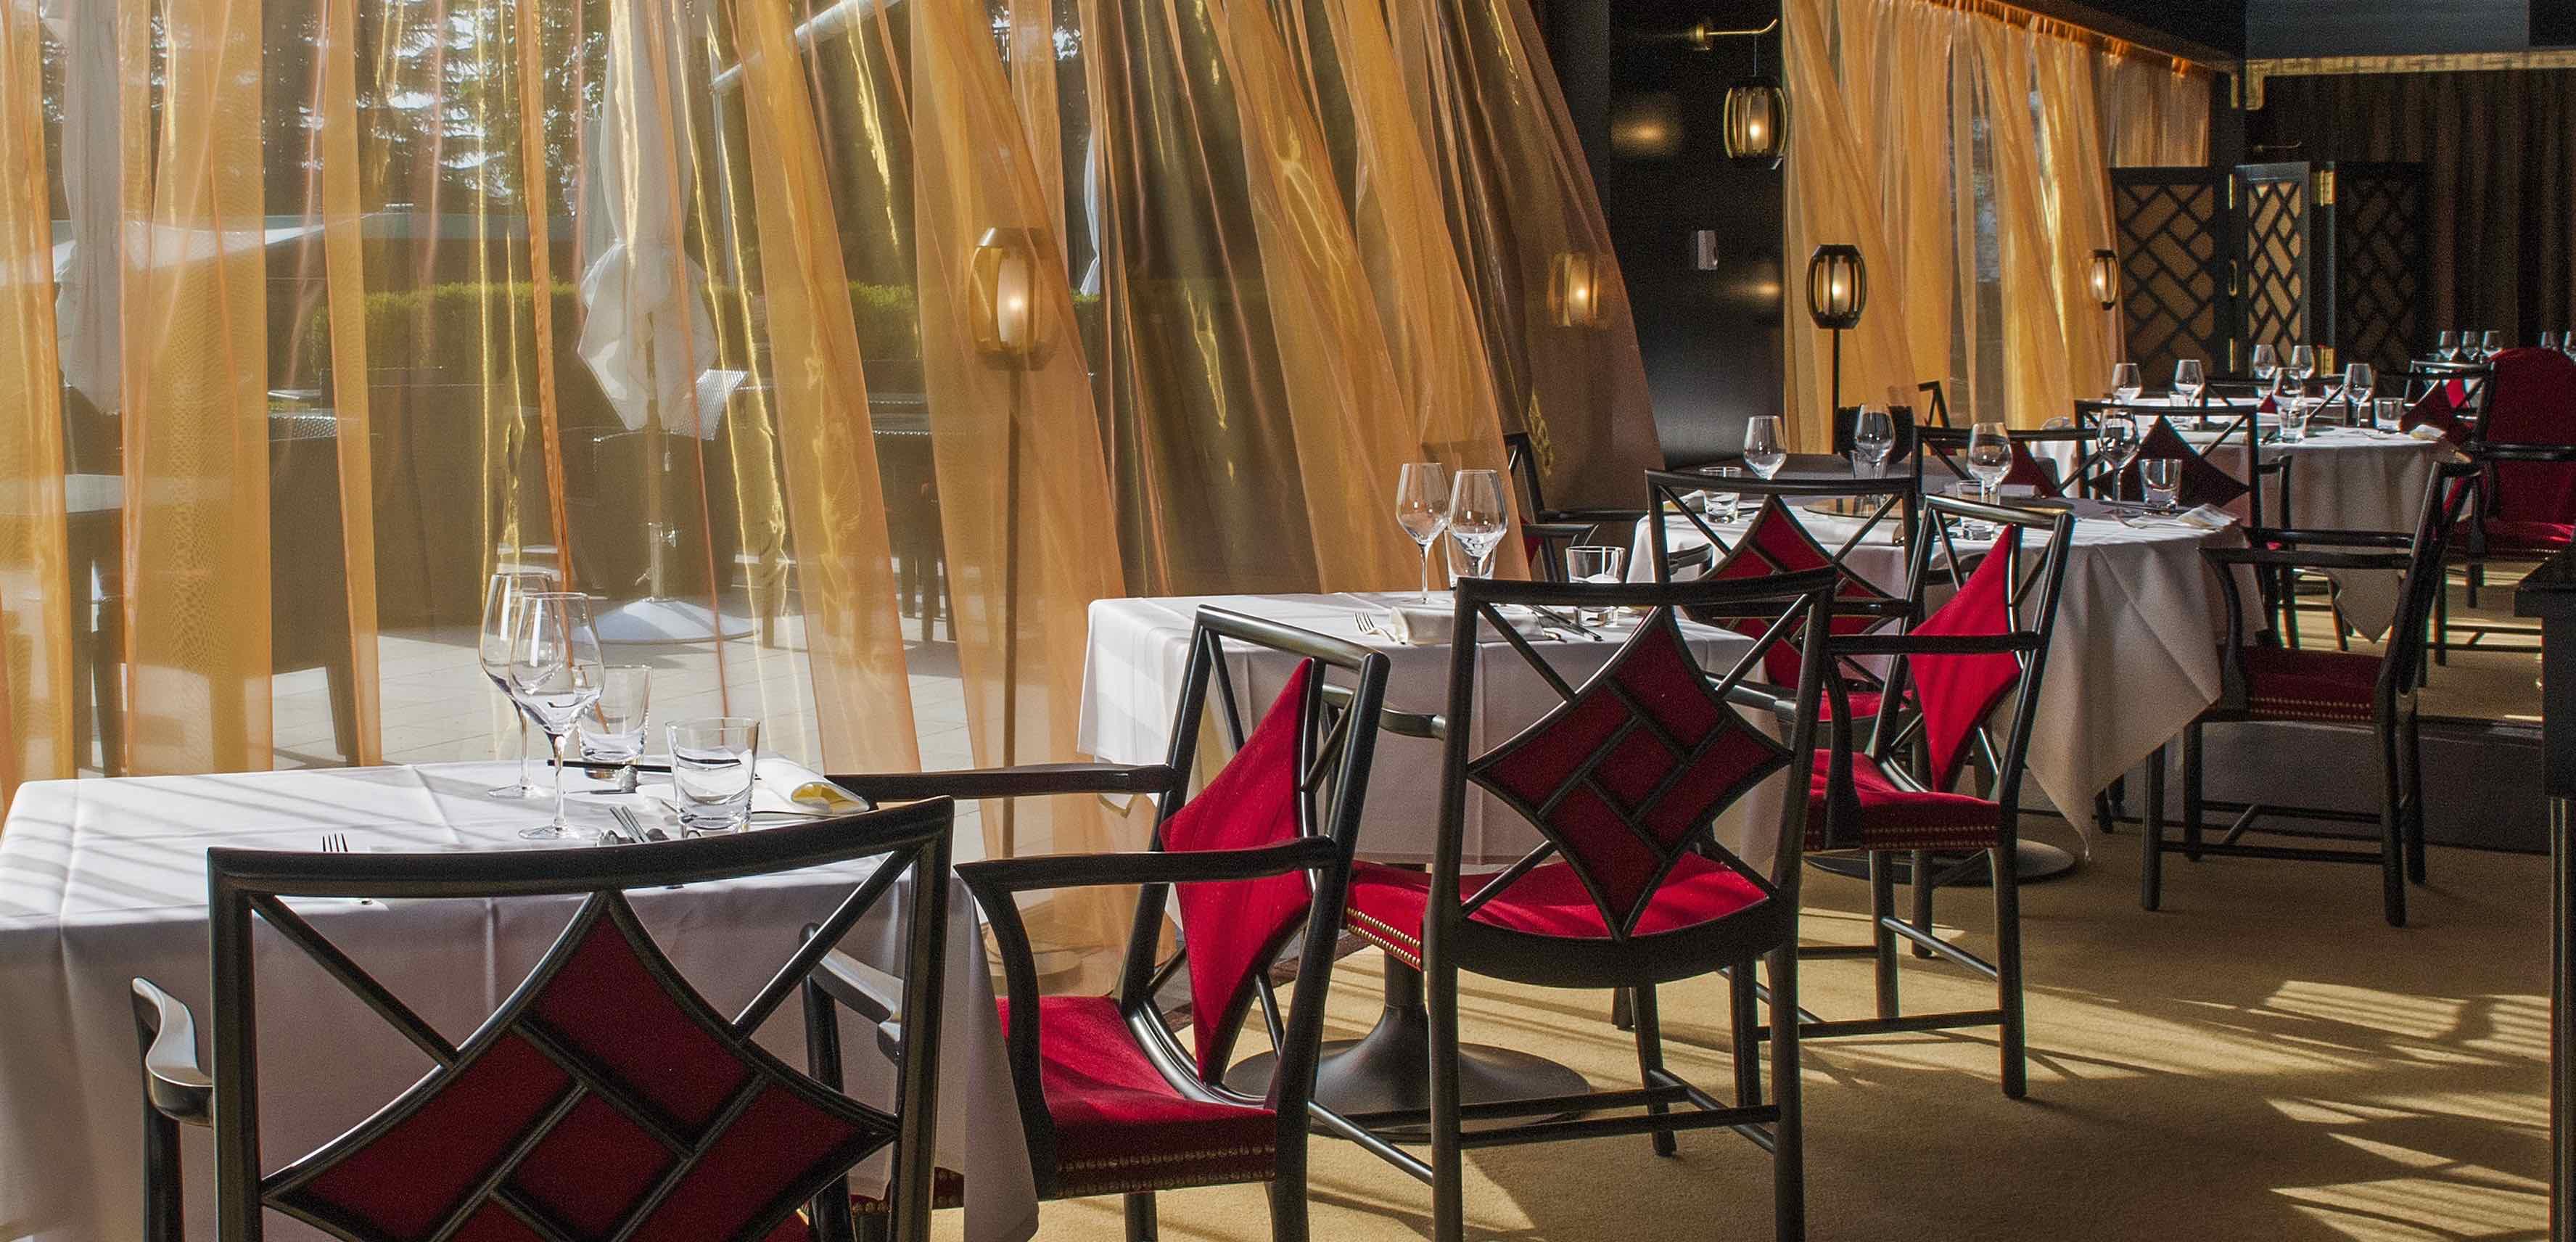 la_reserve_gevene_restaurante_chines_capa1